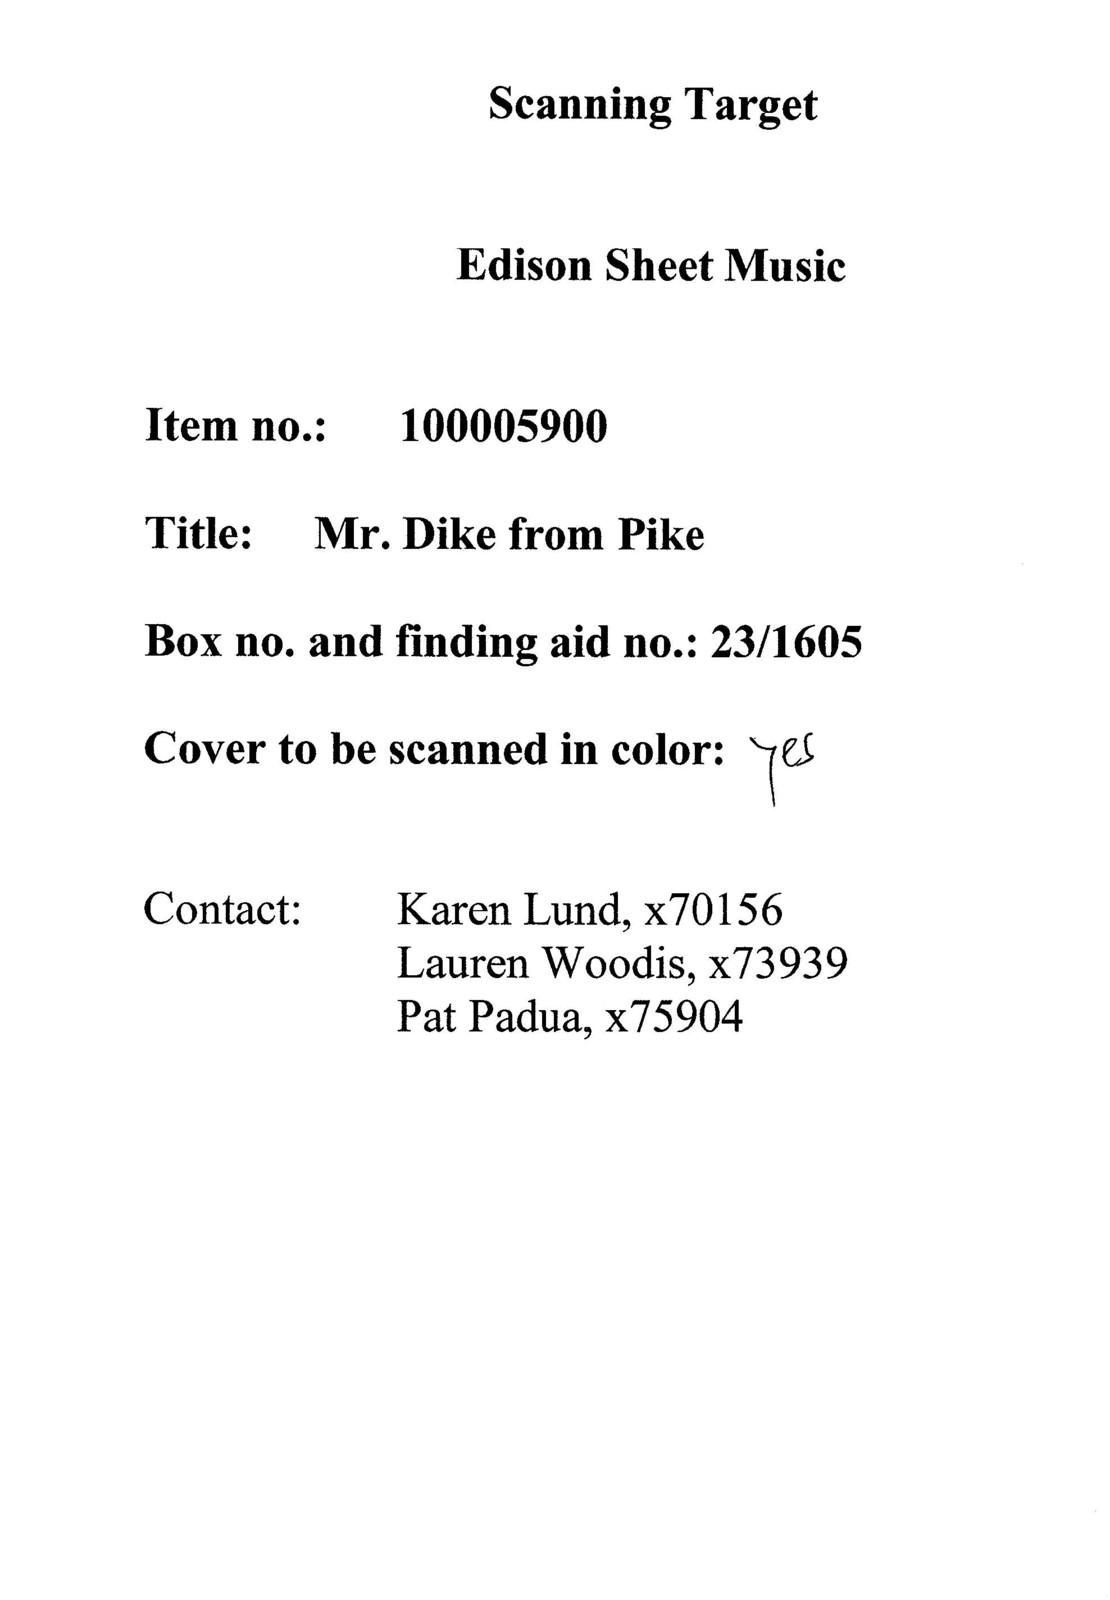 Mr. Dike from Pike